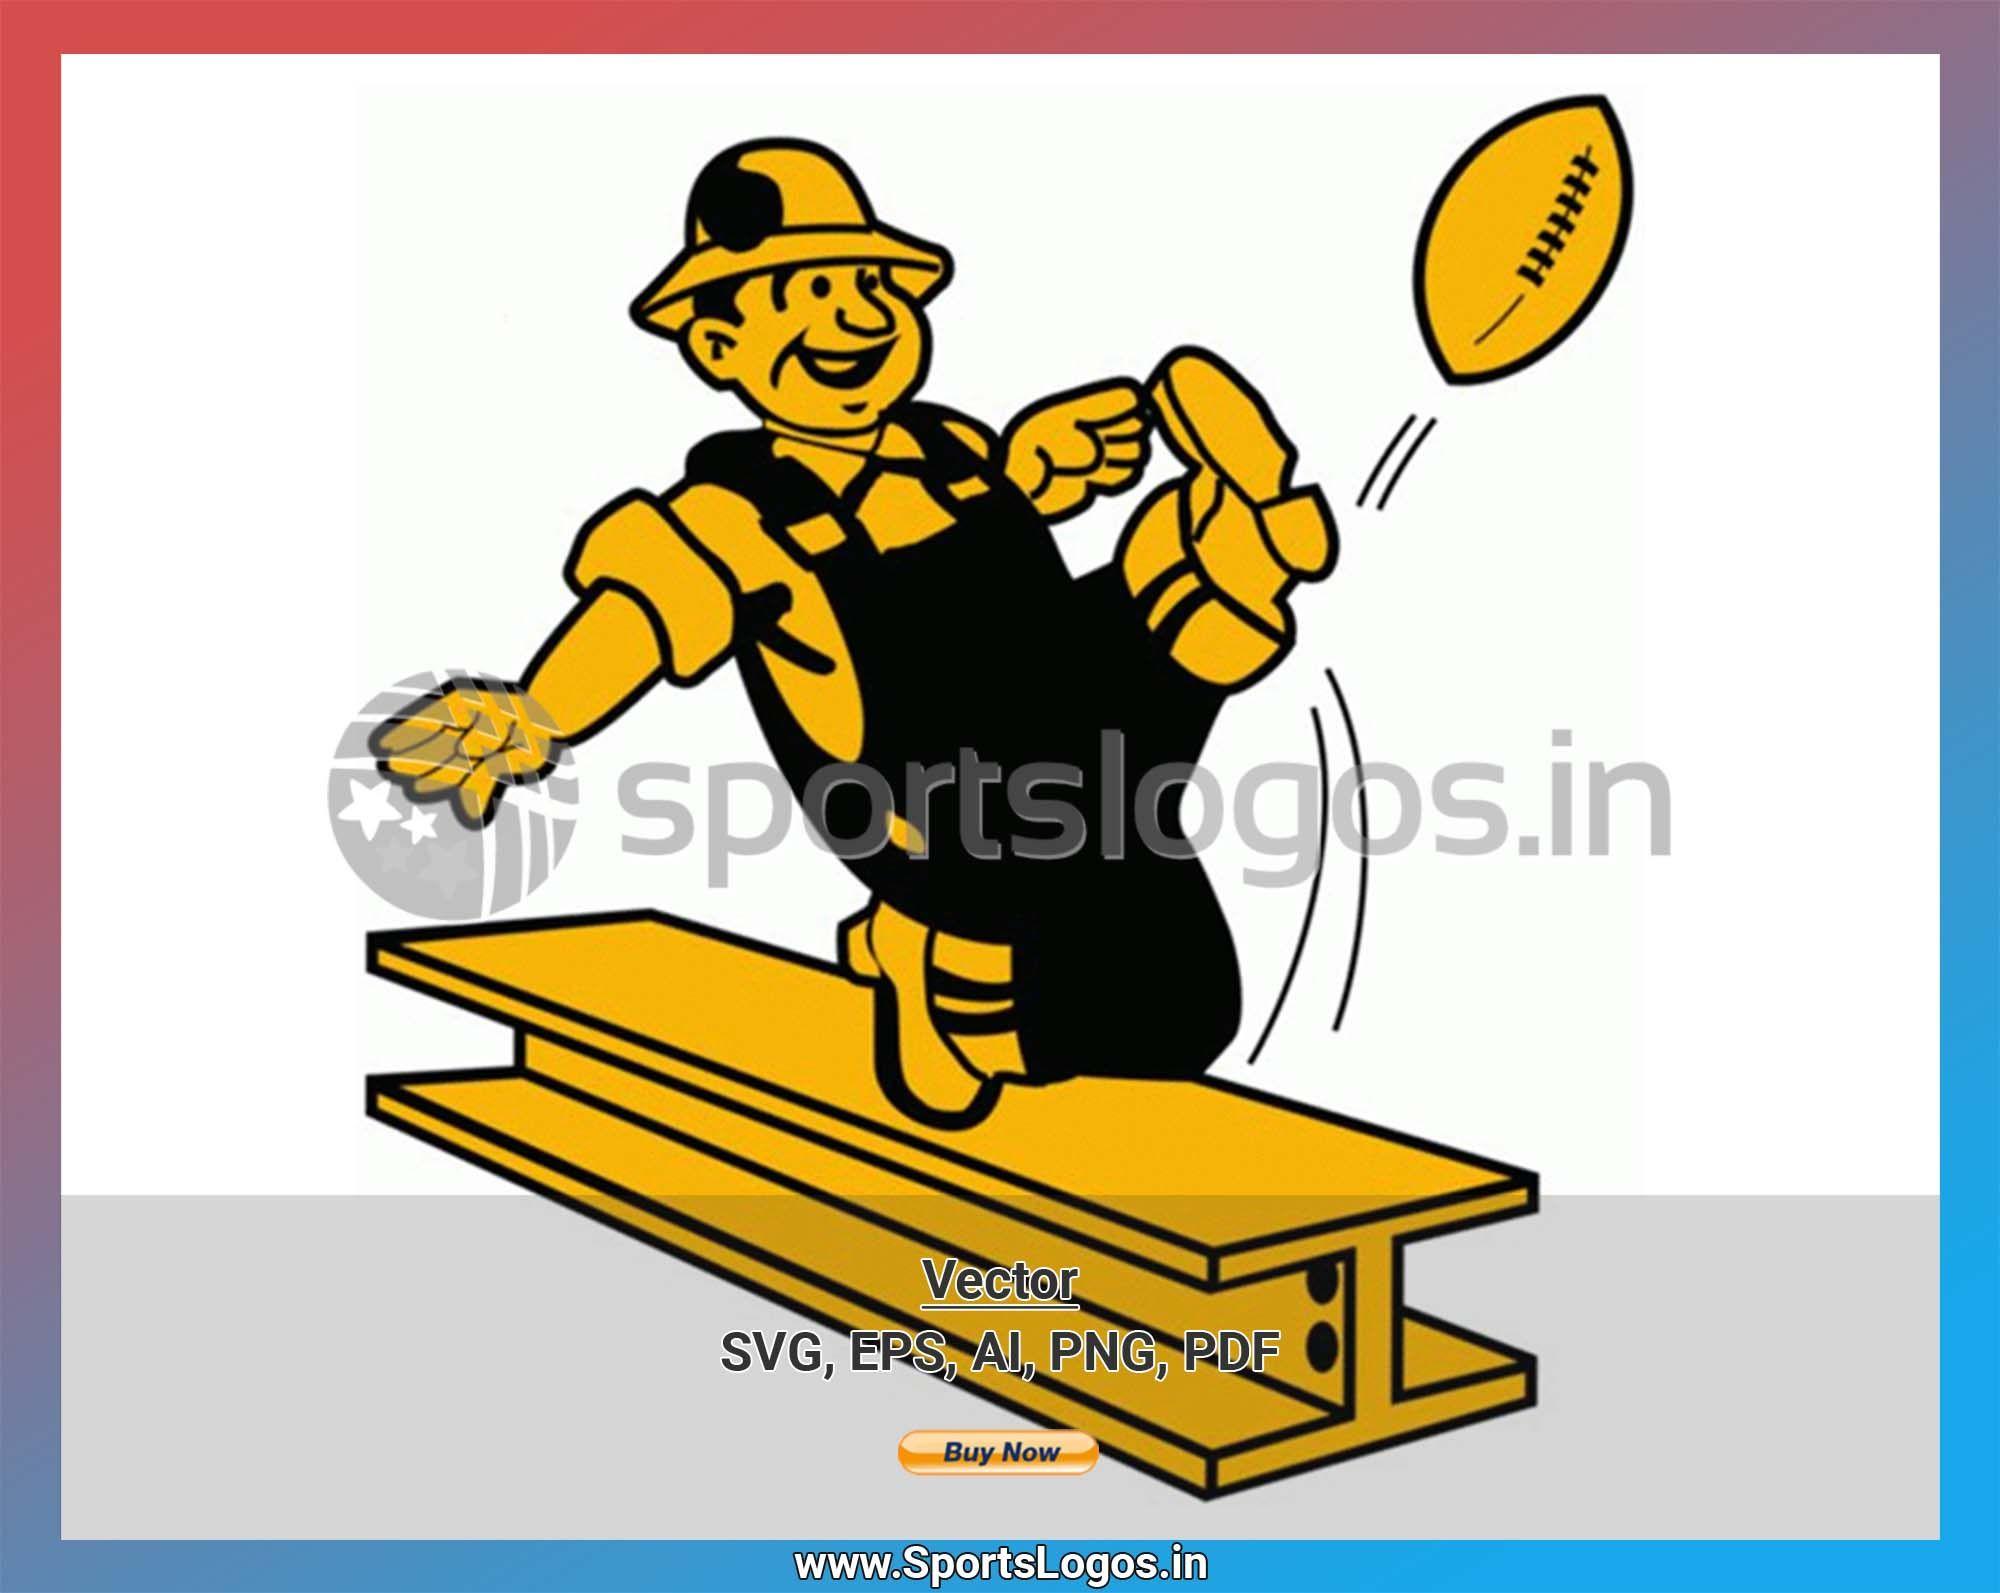 Pittsburgh Steelers 19621968, National Football League